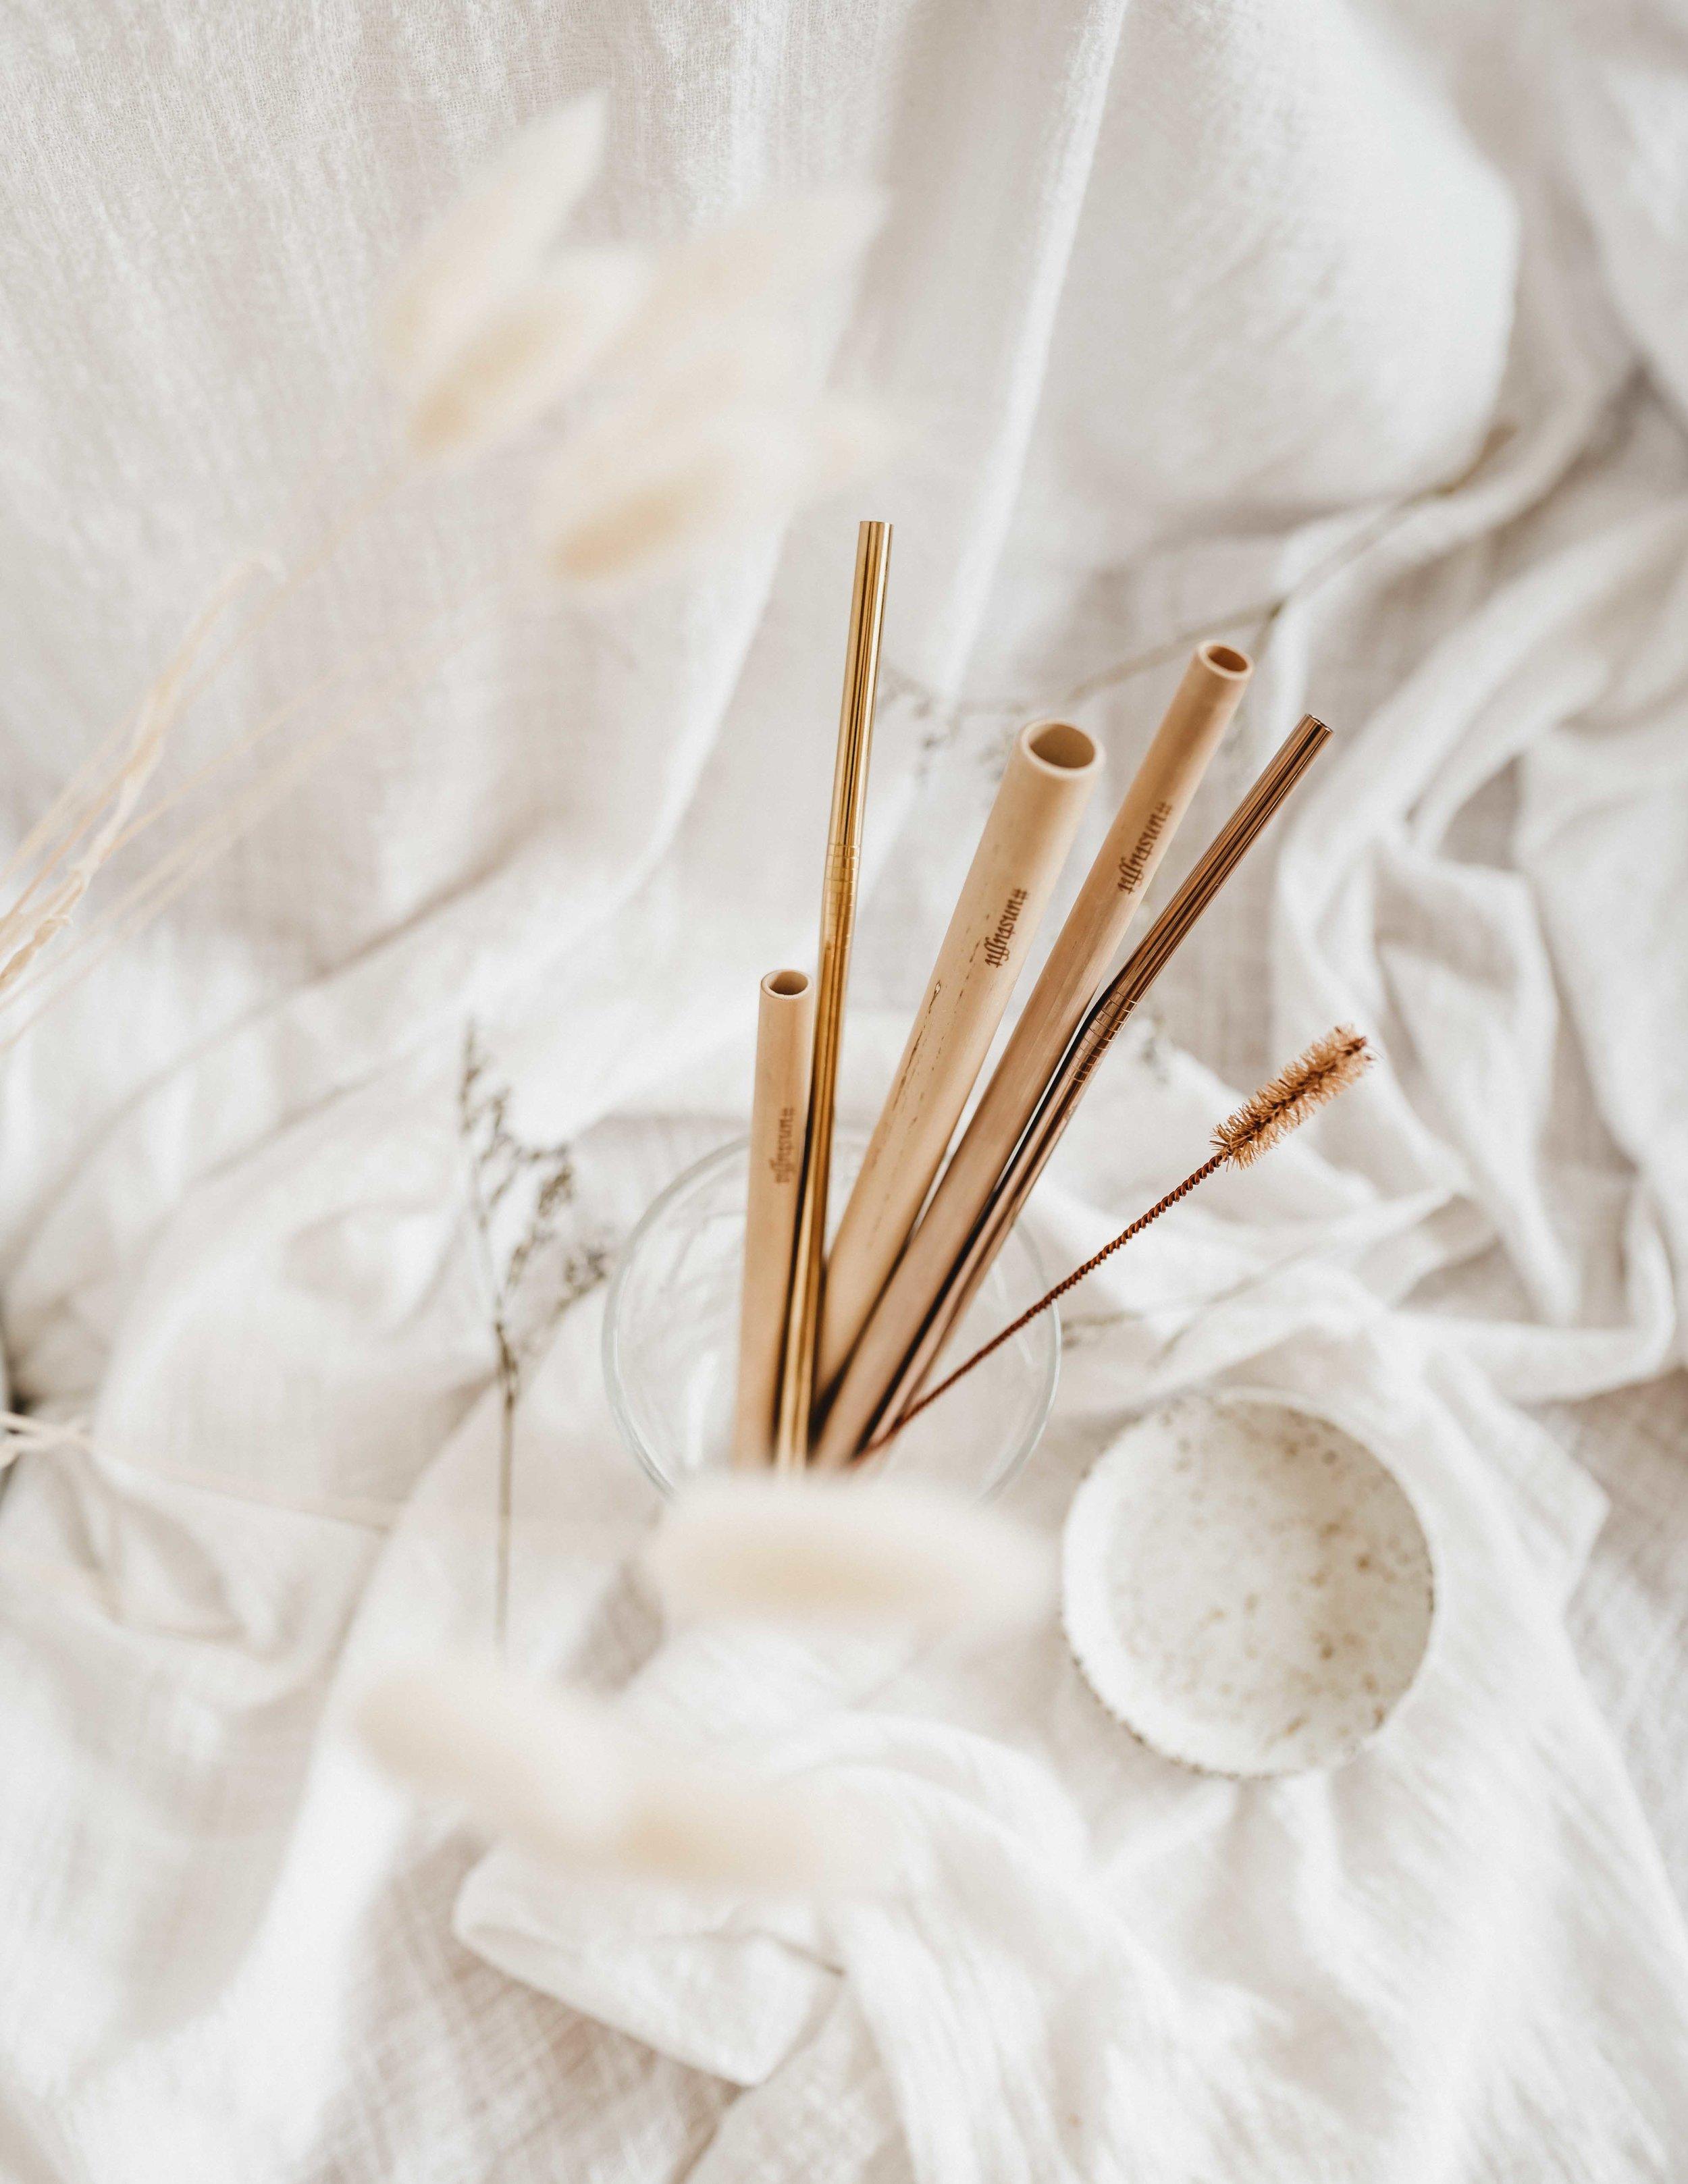 keira-mason-nowhere-and-everywhere-straws-bamboo-metal.jpg